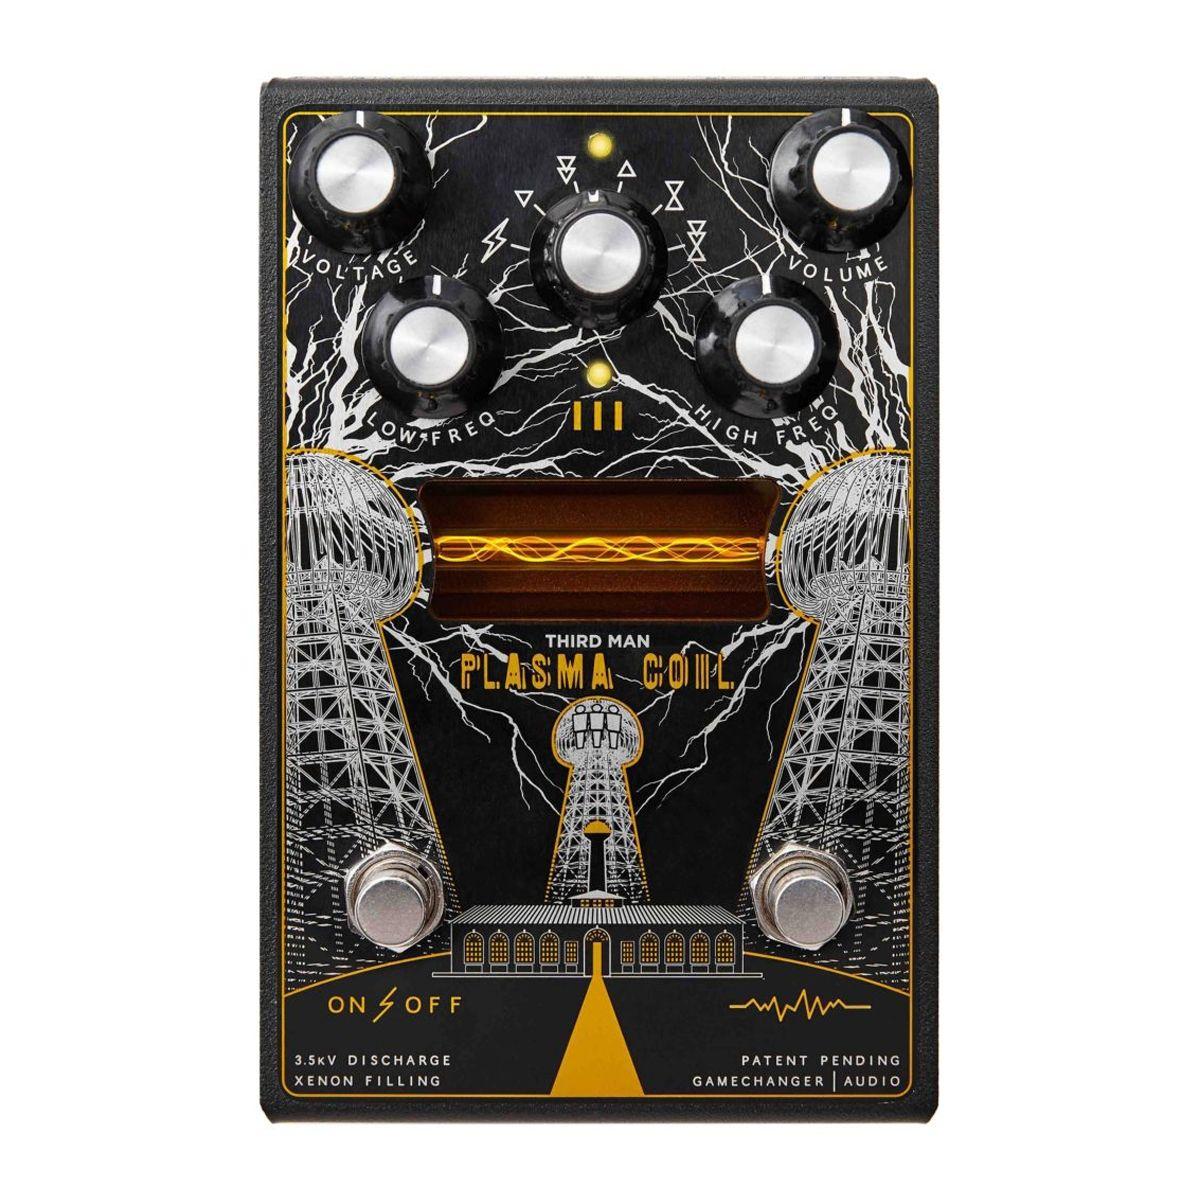 Gamechanger Audio Plasma Coil Distortion Effects Processor (Third Man Records)